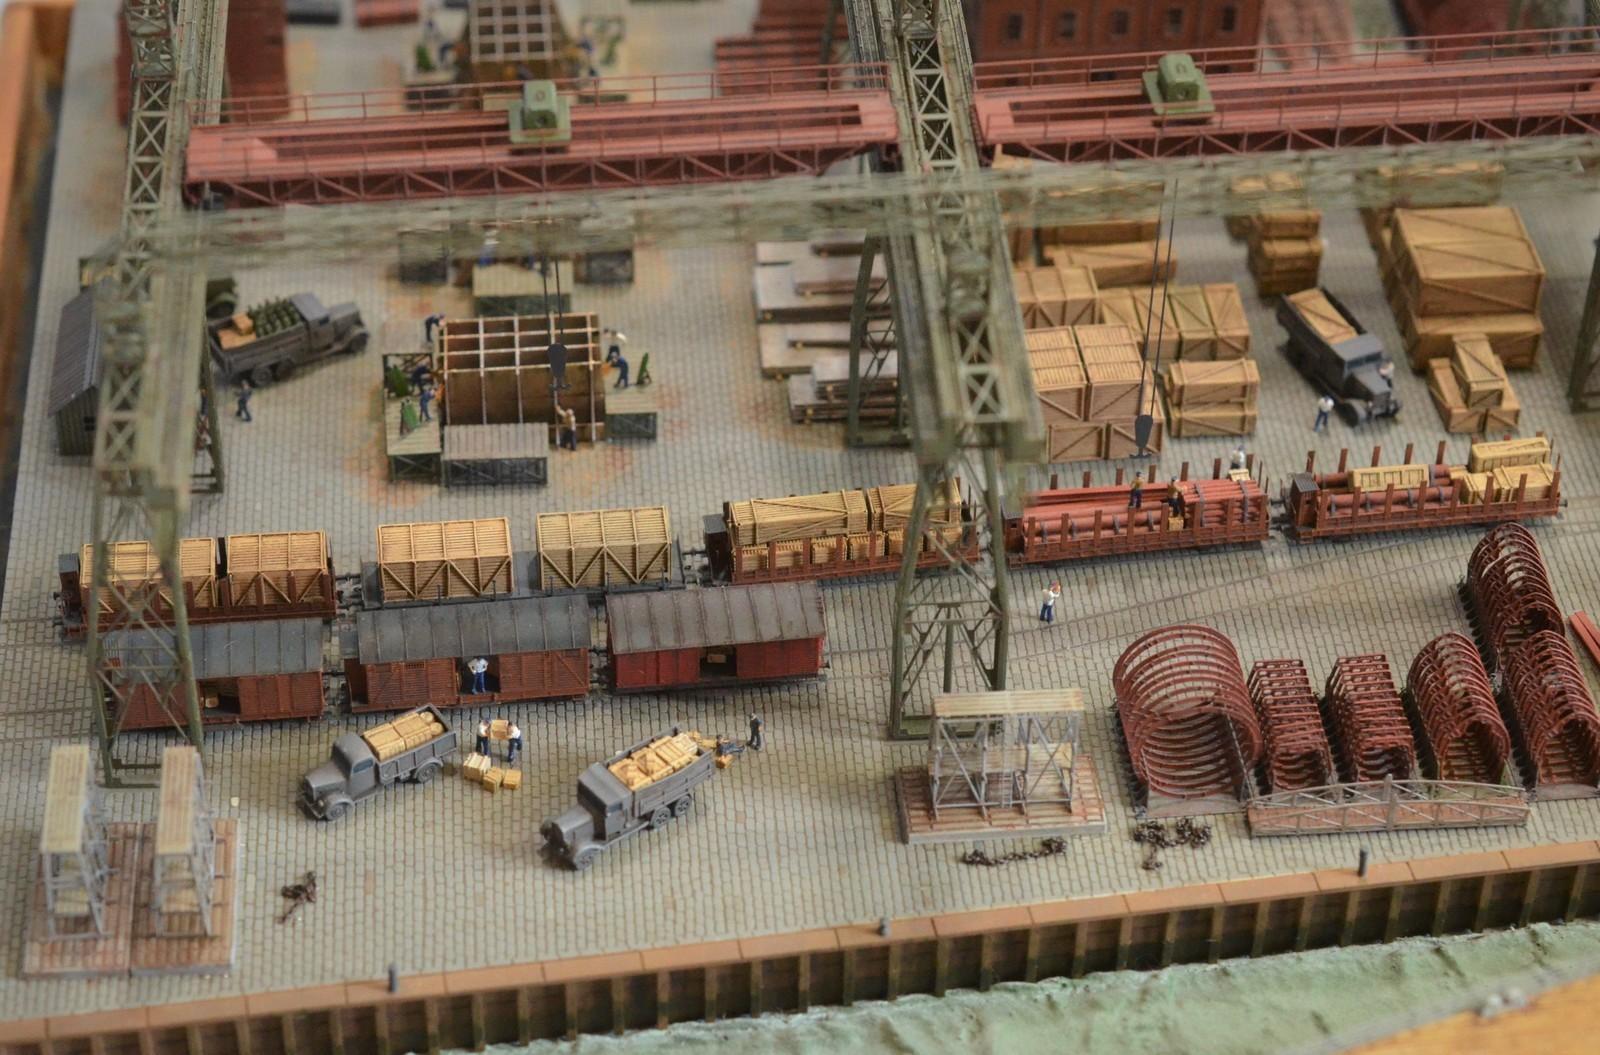 Grande grue 250 t port de Hambourg et Bismarck Revell au 1/350 - Page 11 3UVeGP